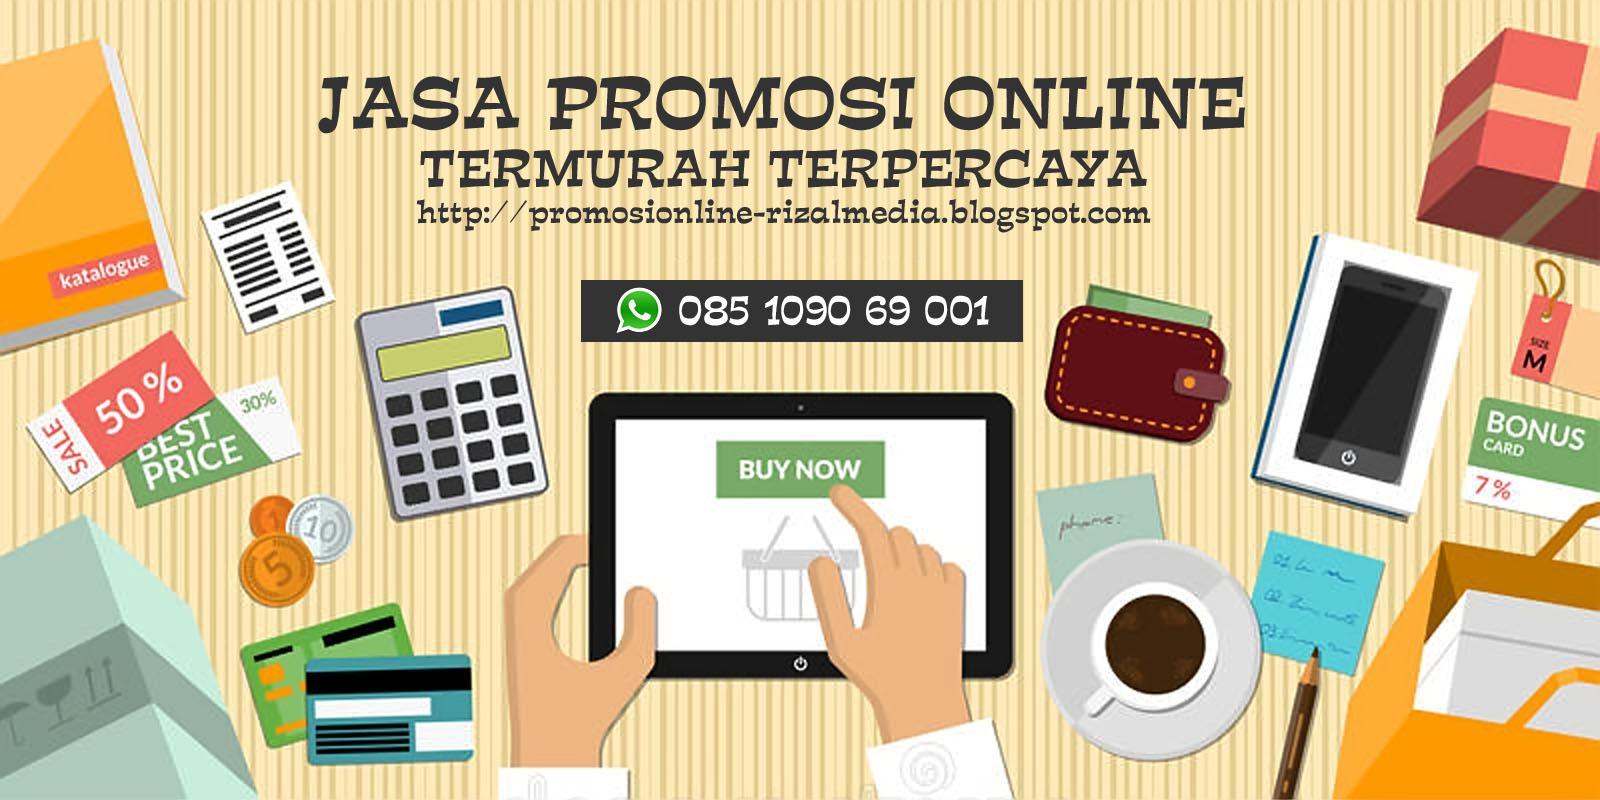 Jasa Promosi Online Murah Terpercaya RIZALmedia Online